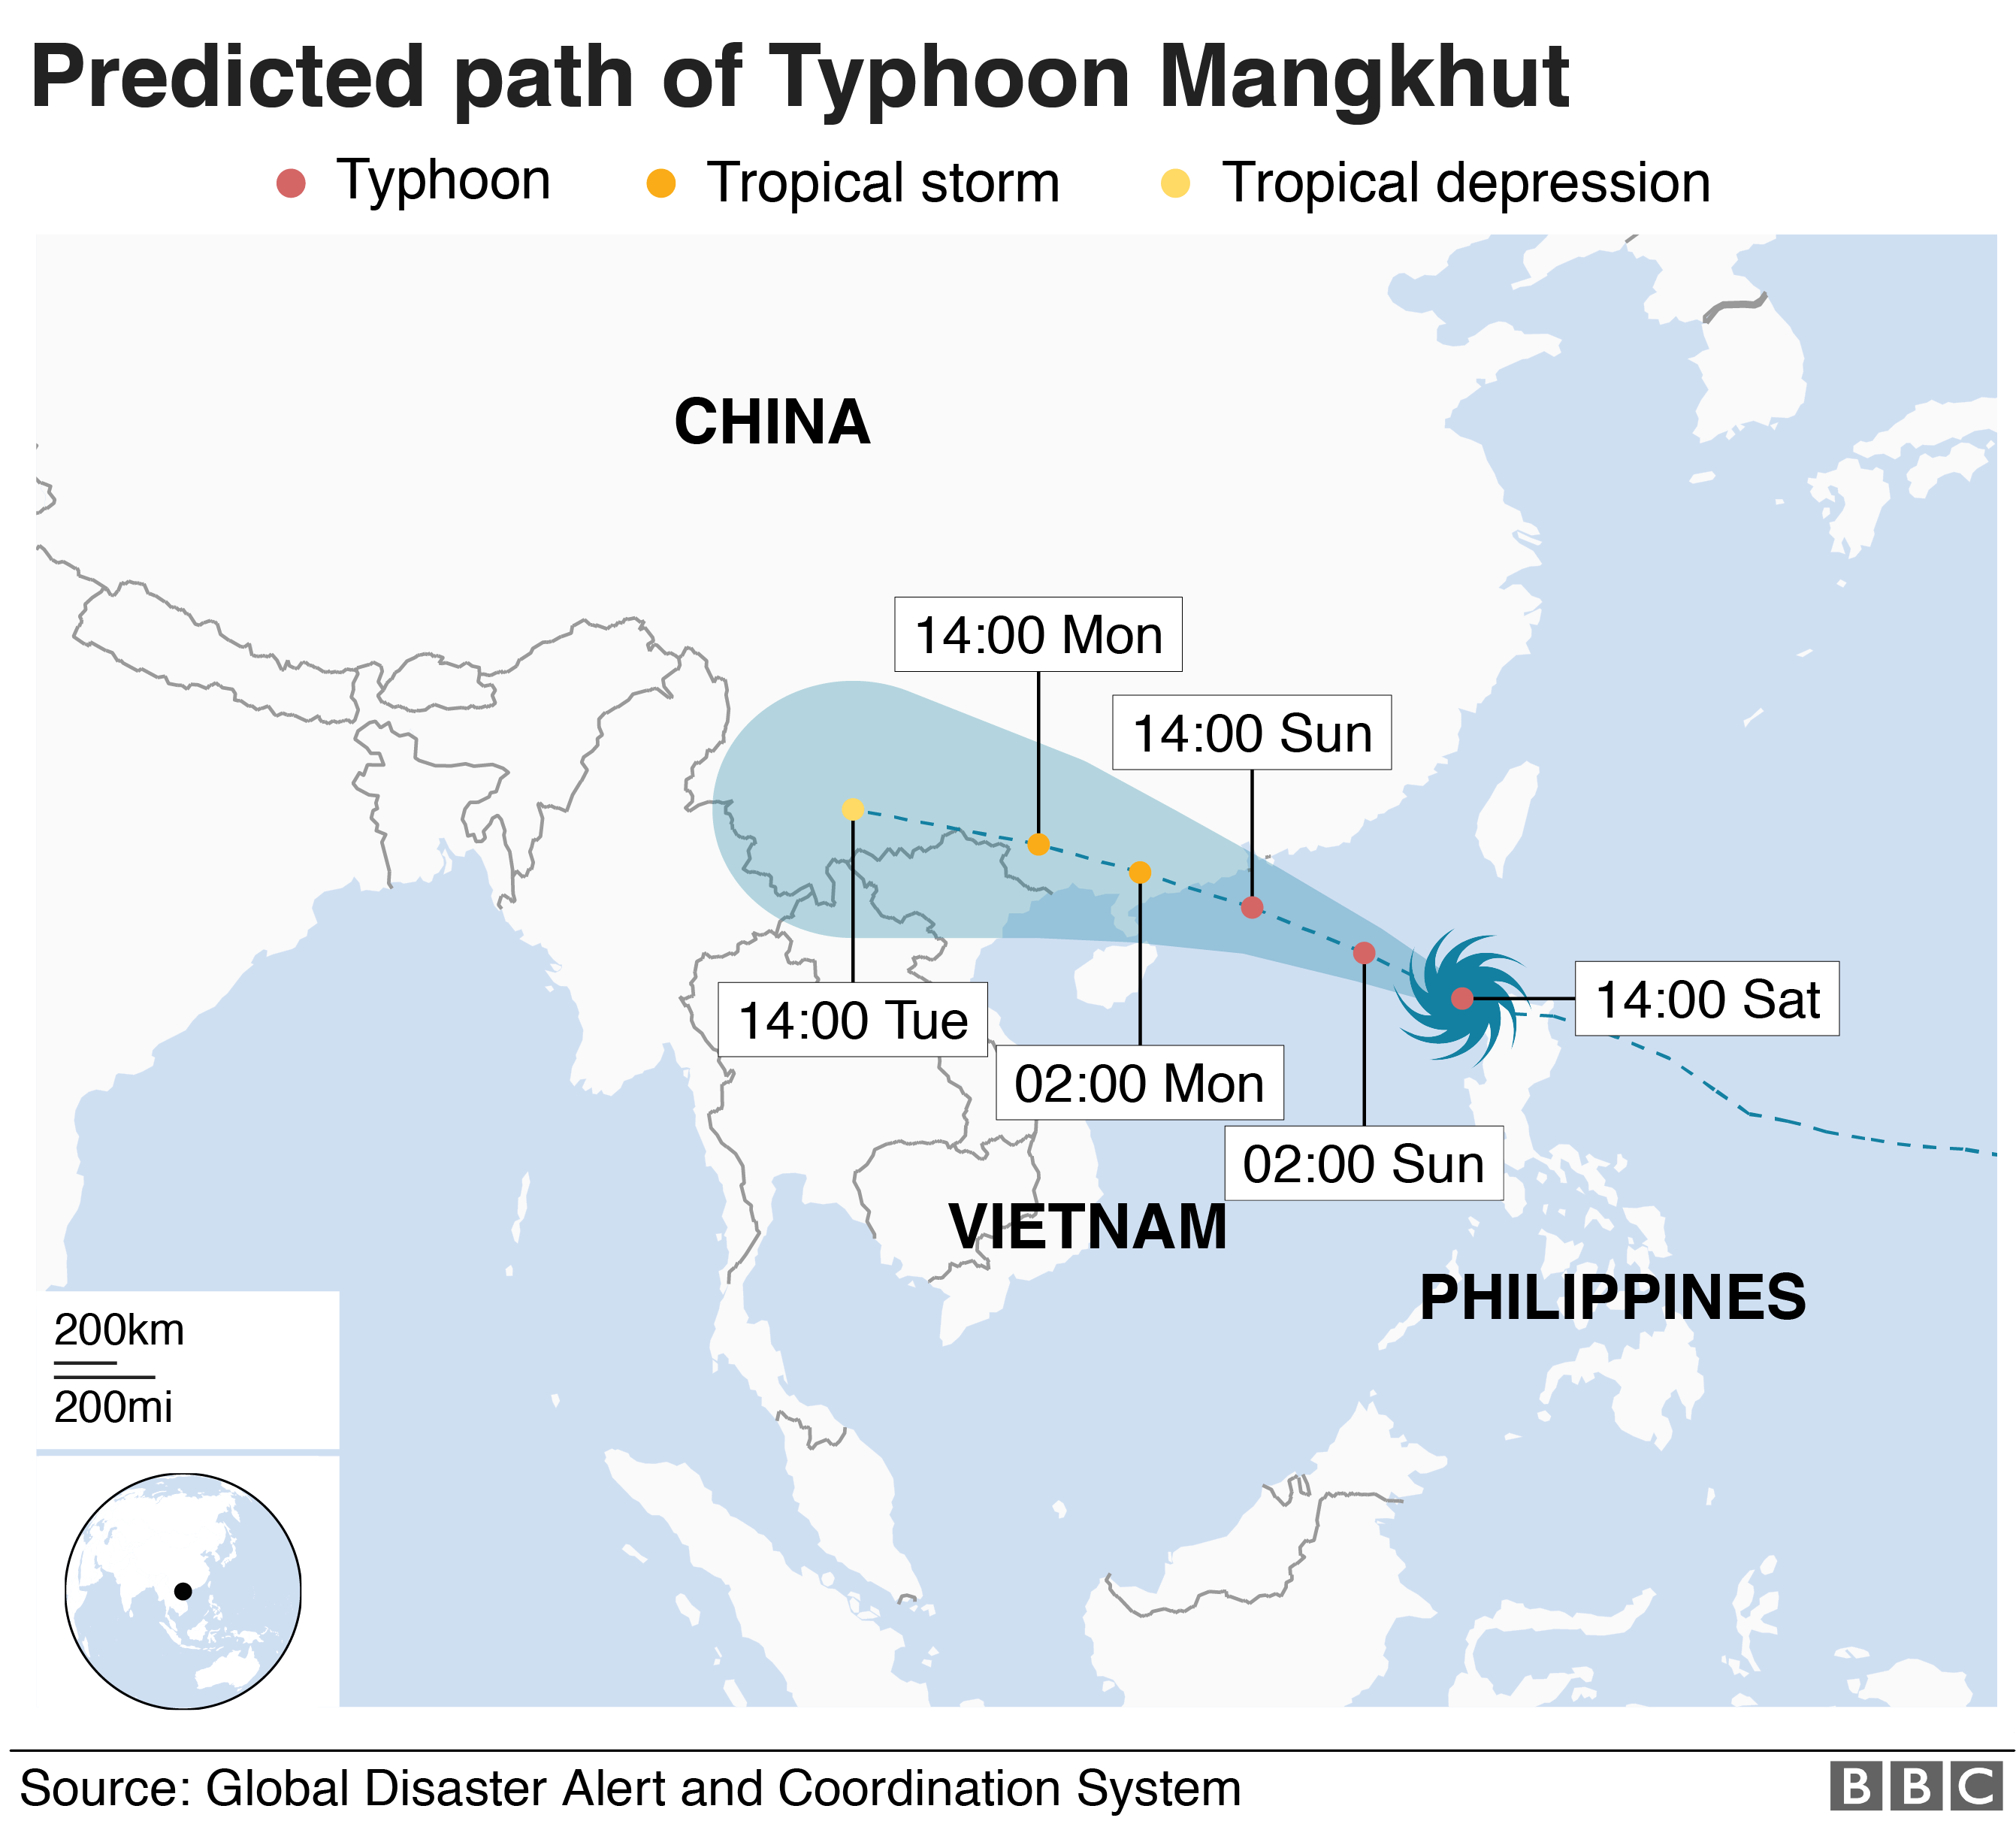 Predict path of Typhoon Mangkhut